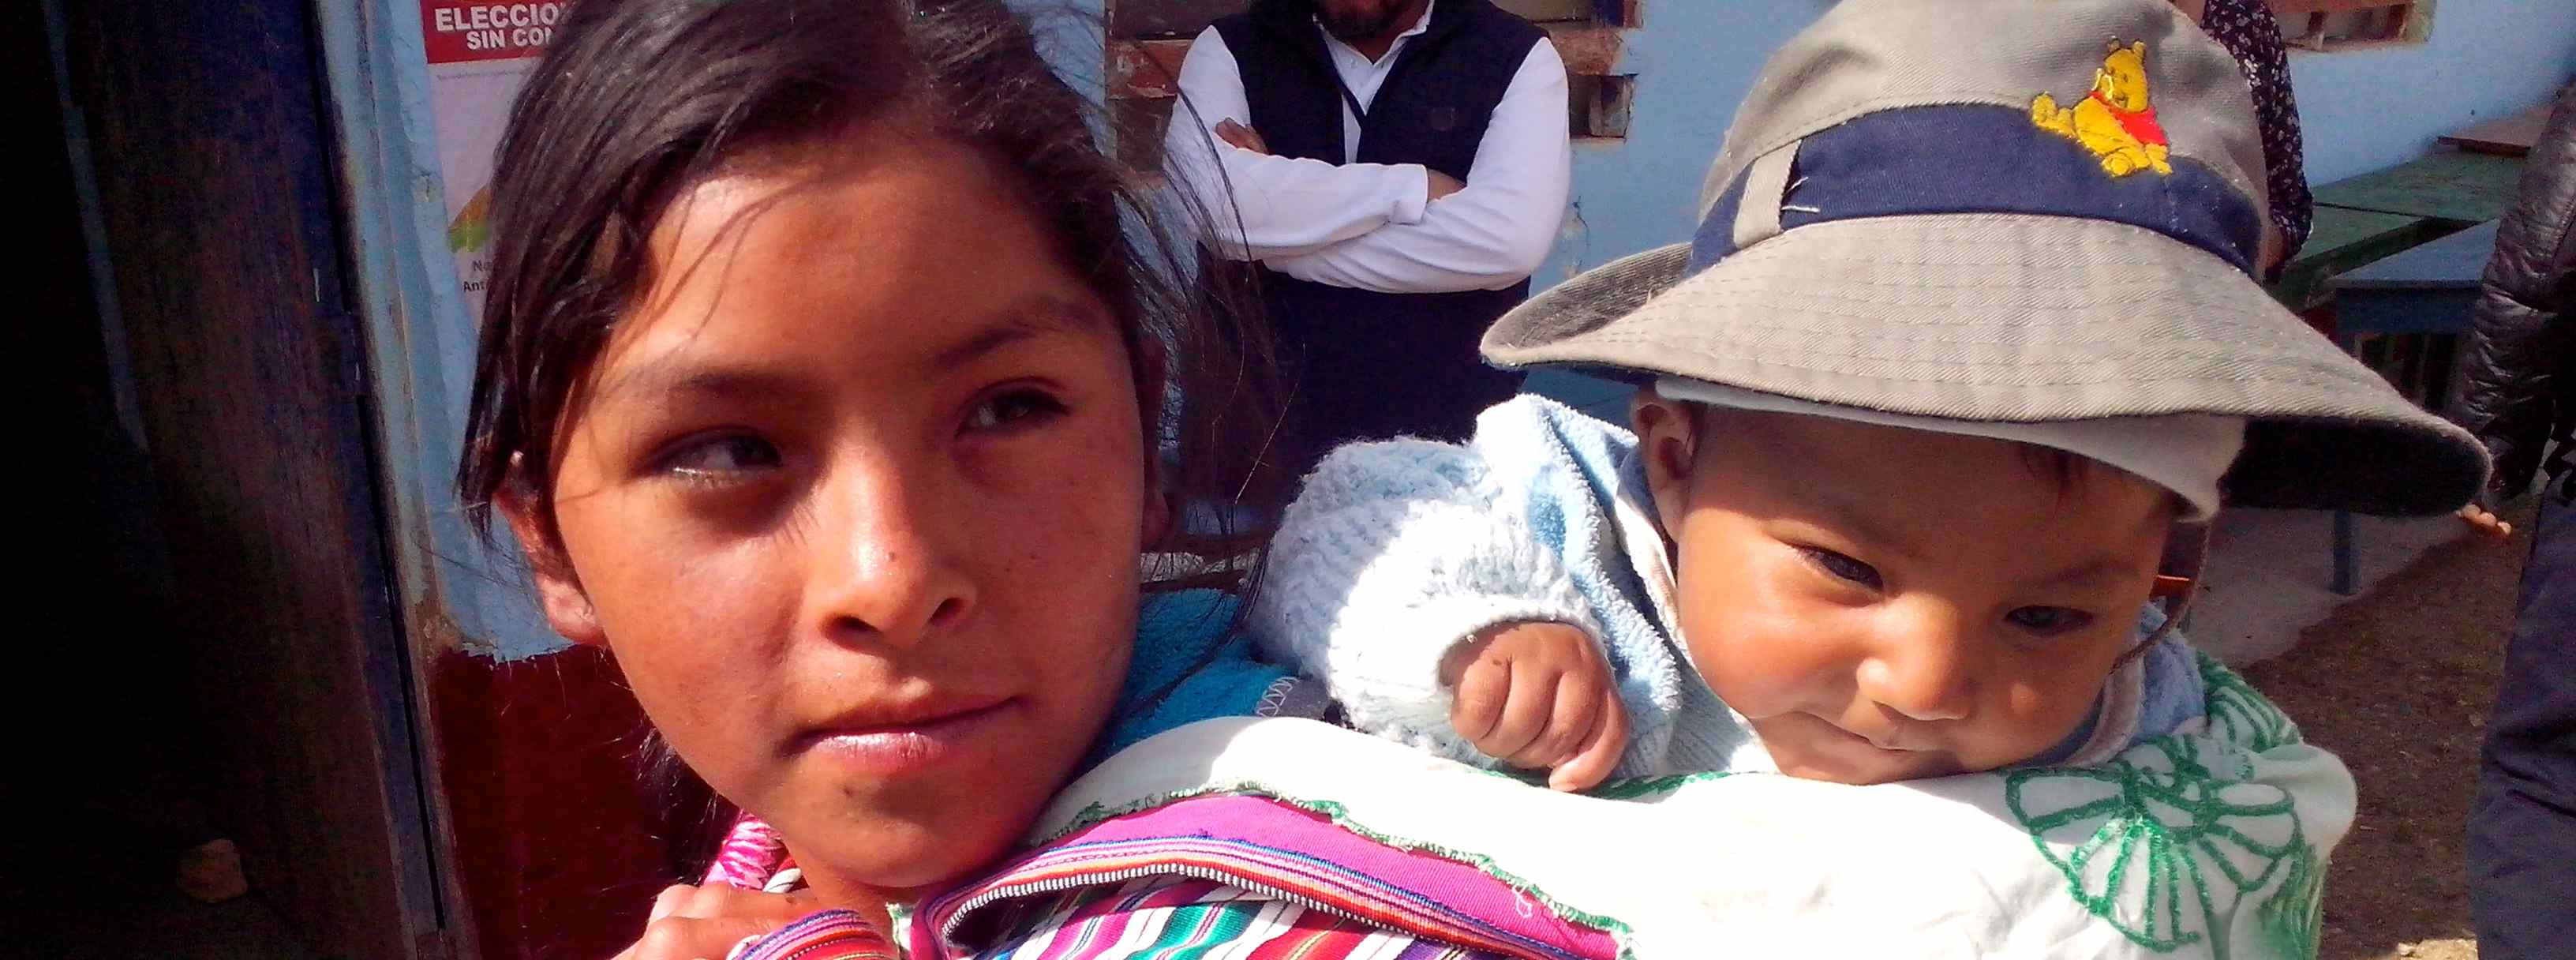 The Surprising Peruvian People - SUN